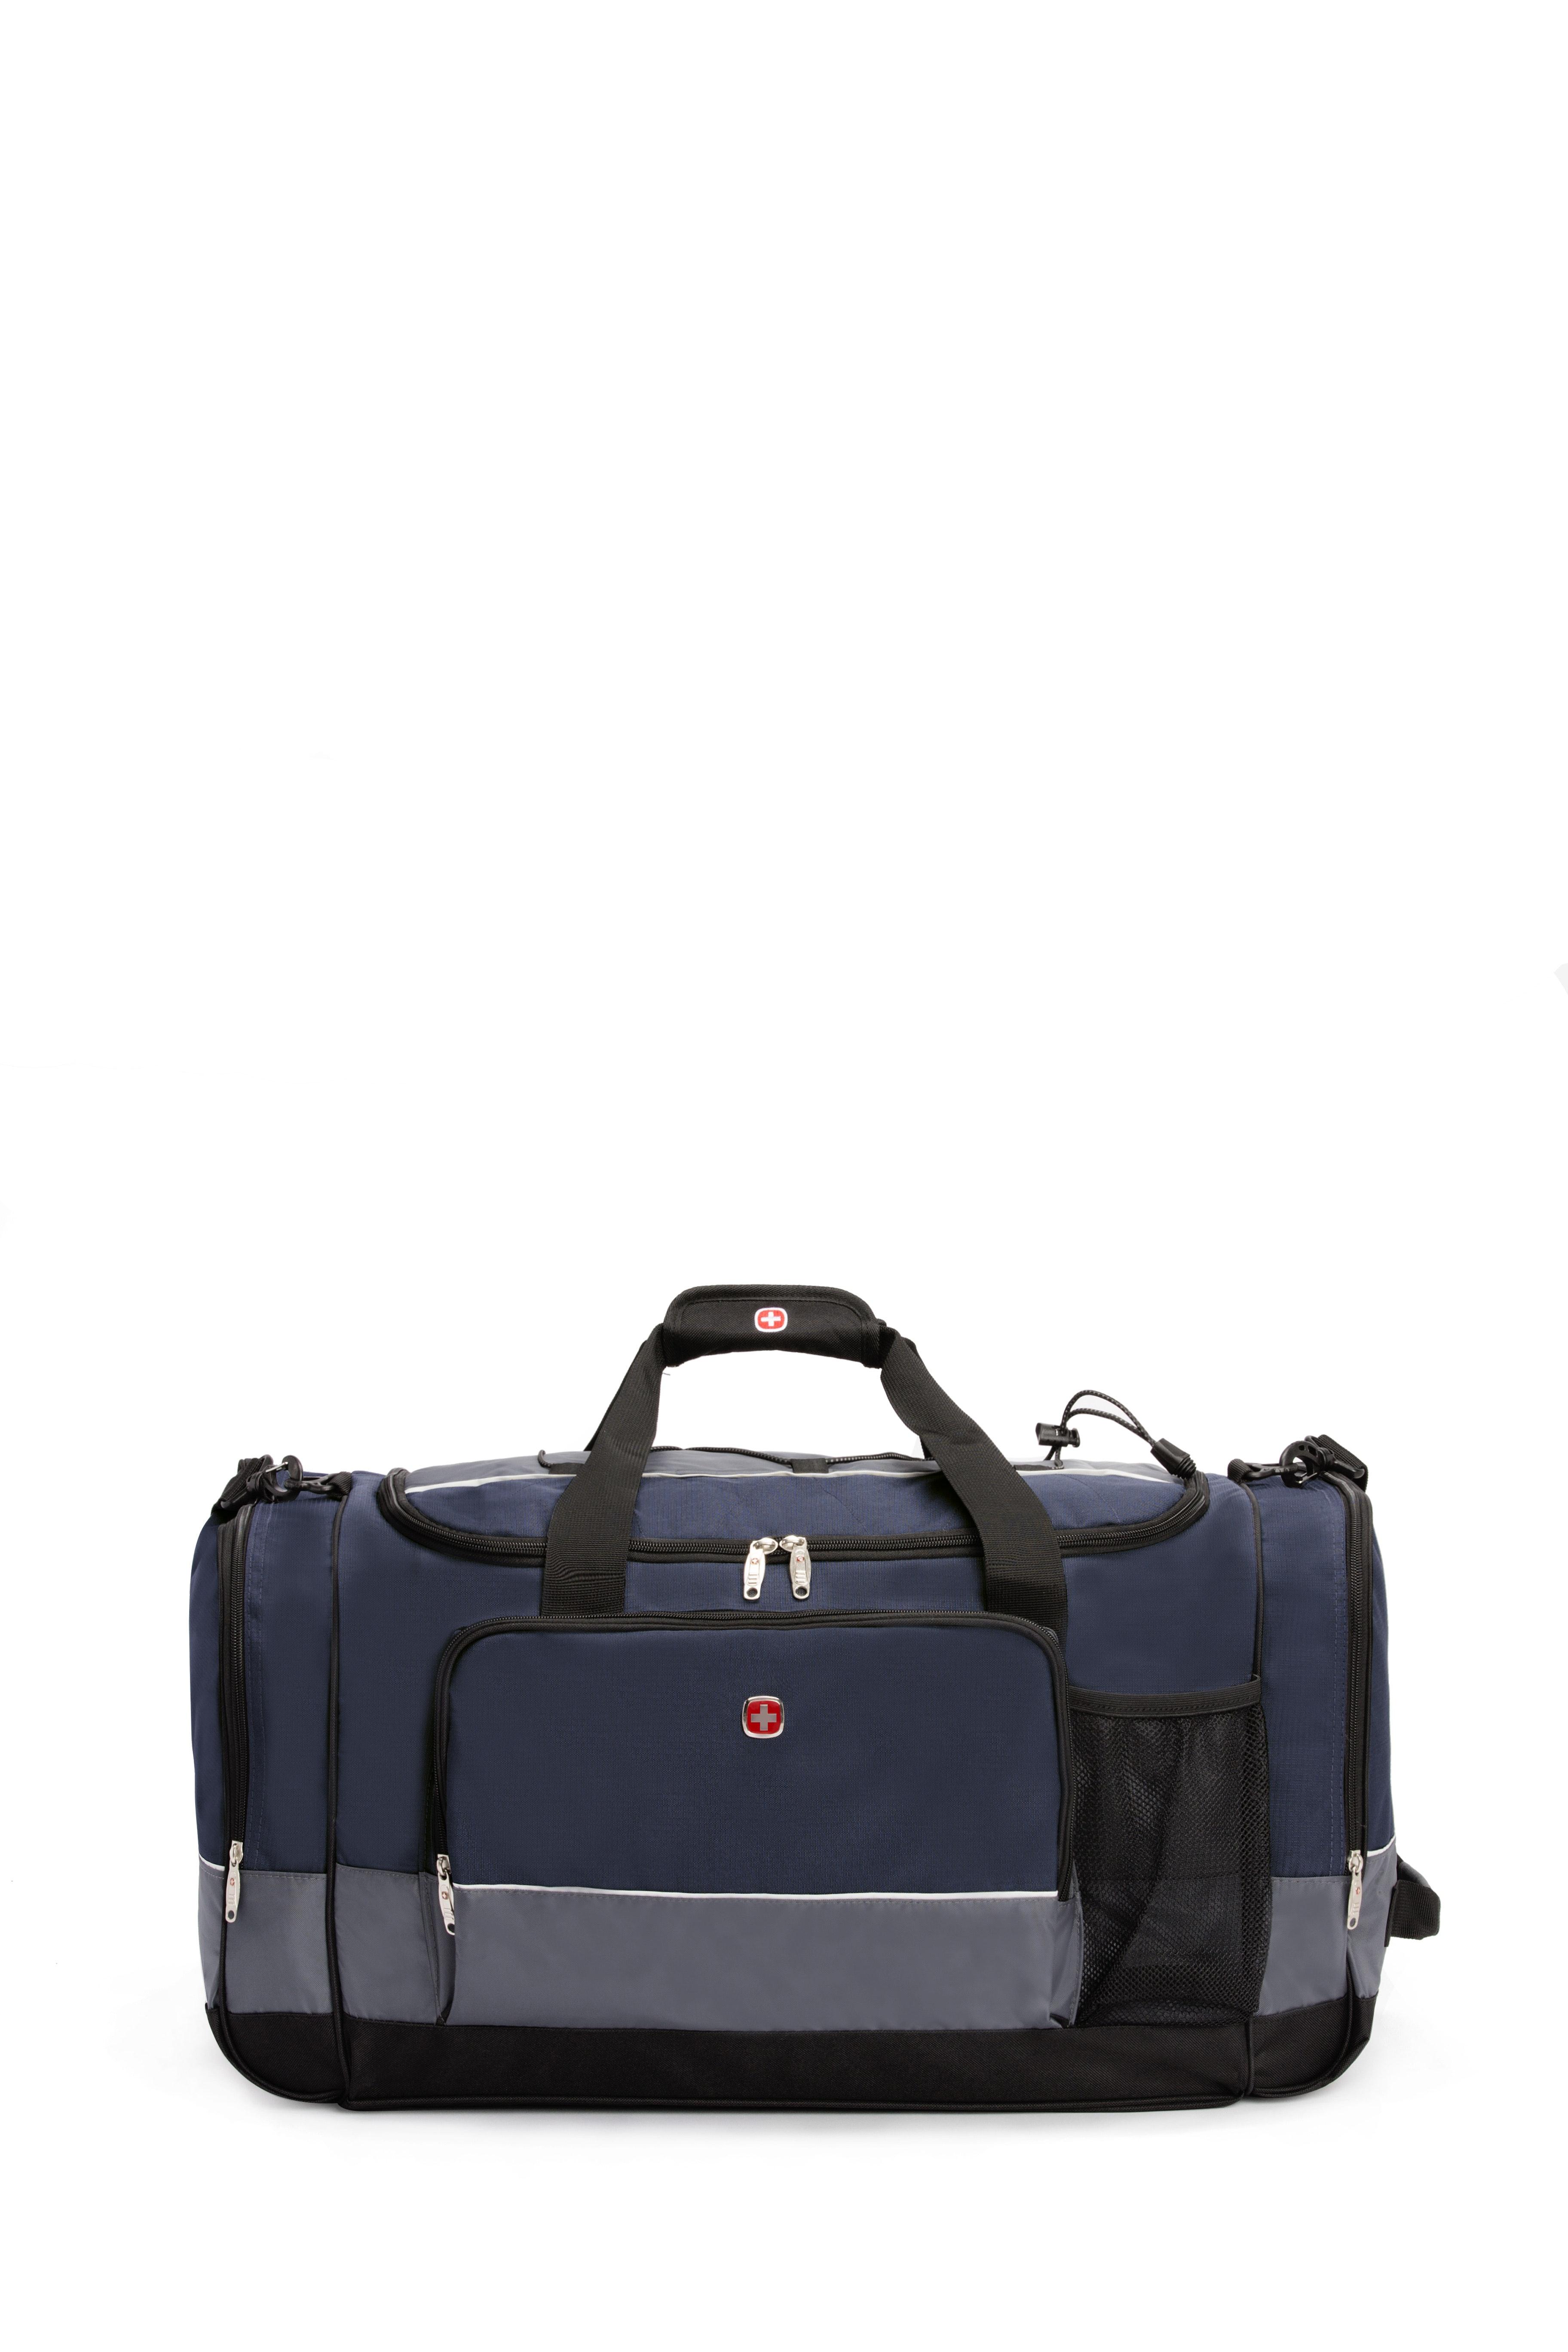 Mens and Womens SWISSGEAR 20 Duffel Bag Gym Bag Travel Duffle Bags Black